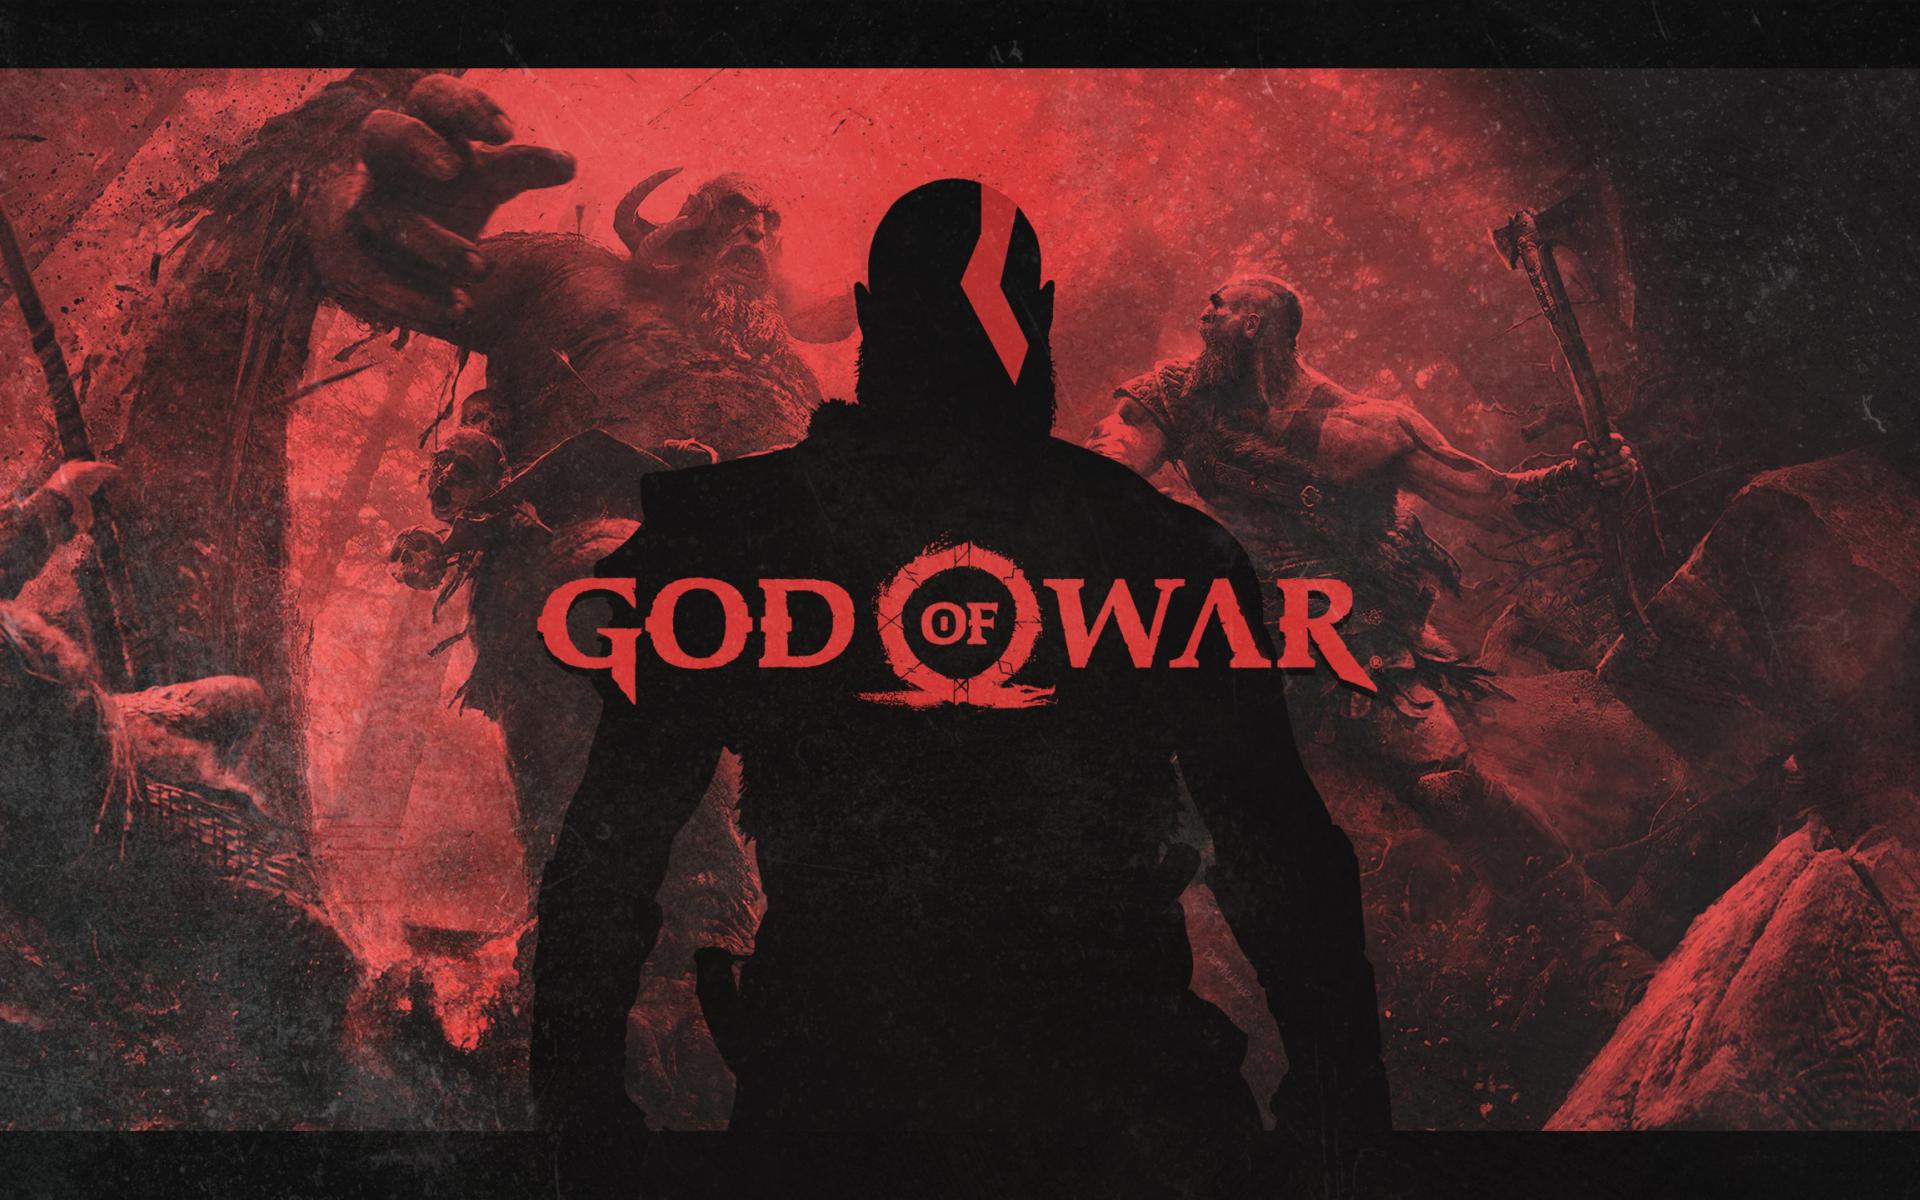 God Of War Ps4 Video Game 2018 1920x1200 Wallpaper